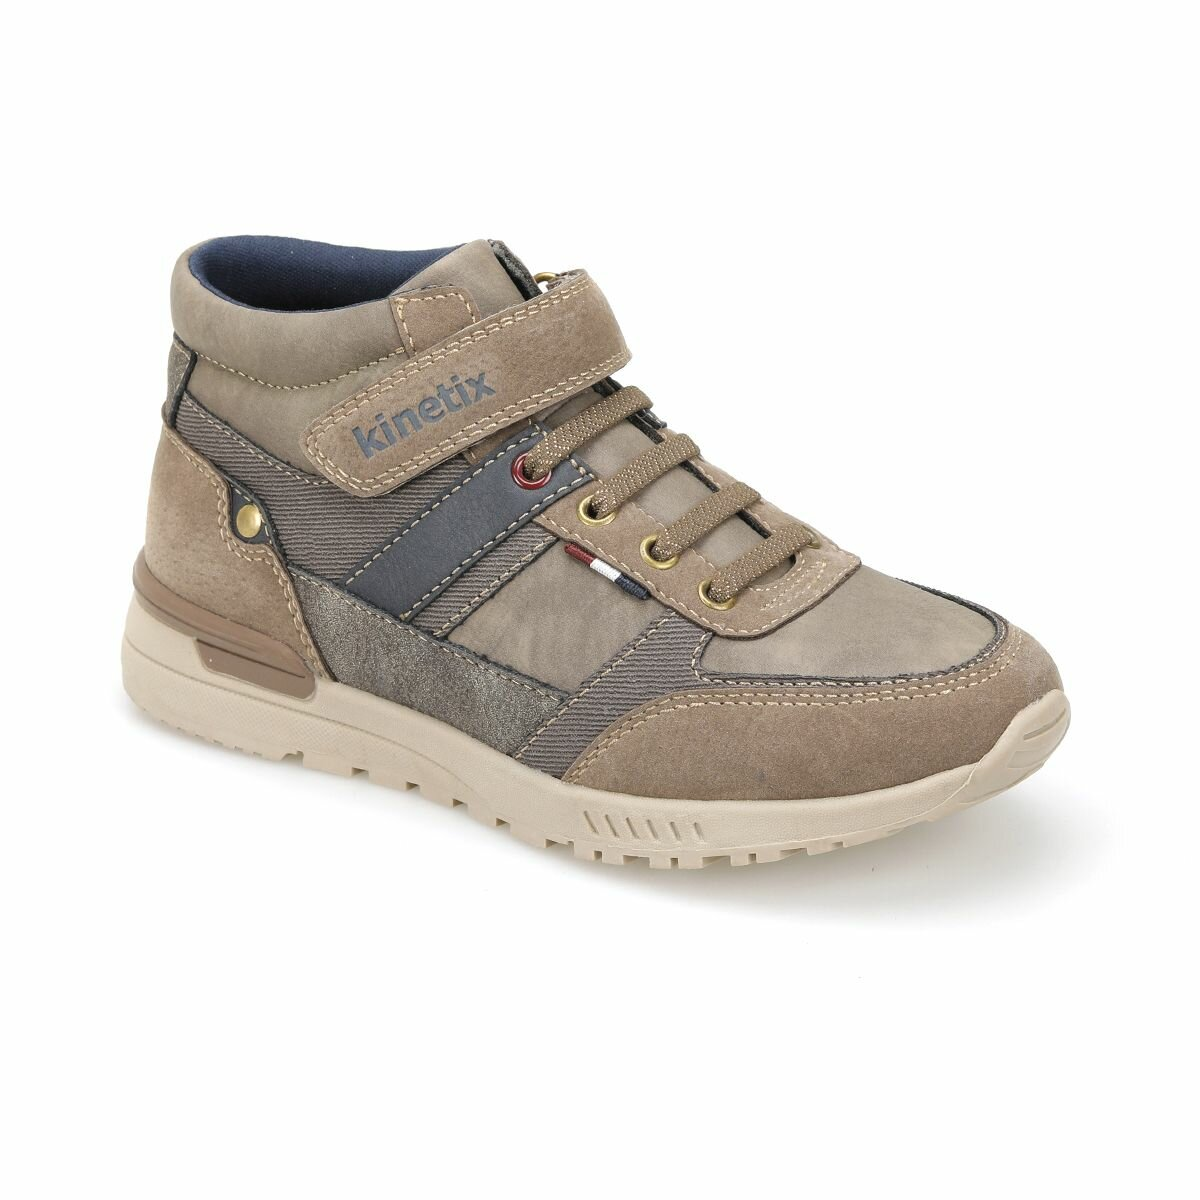 FLO TESLA Brown Male Child Sports Shoes KINETIX